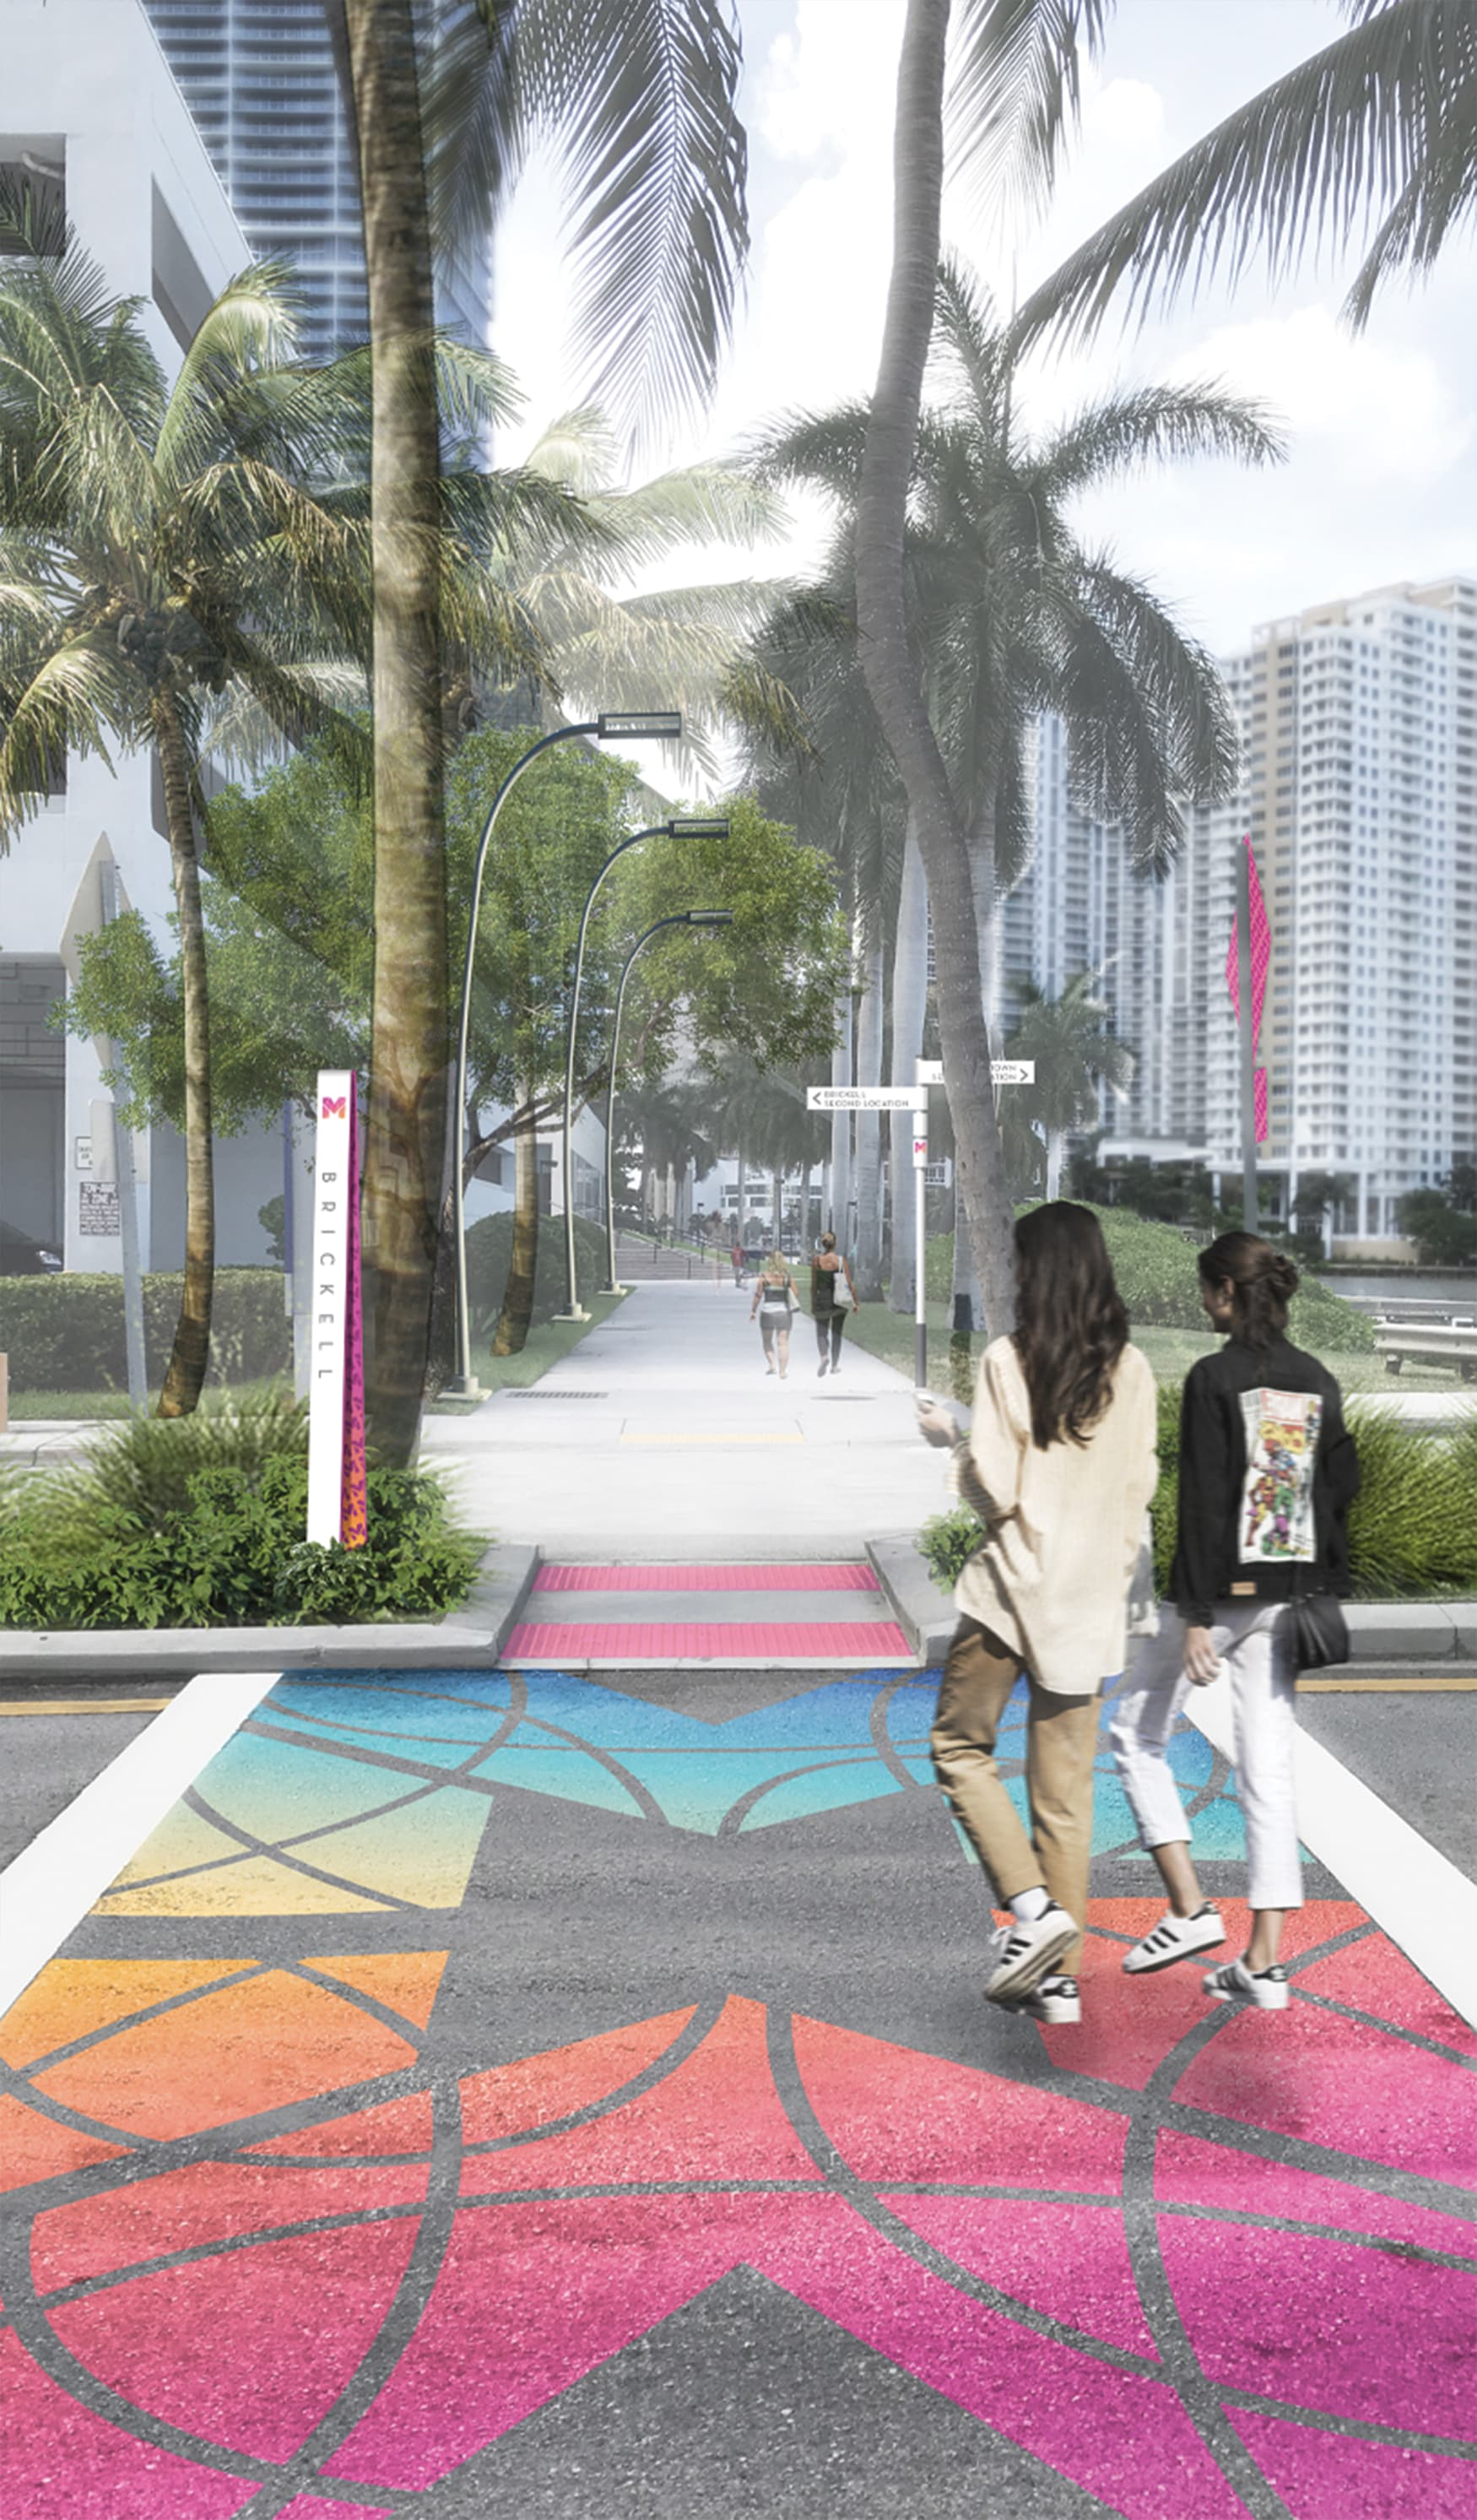 Civic Design, Transit Design, Waterfront Wayfinding Design, Streetscape Design, Park Wayfinding & Signage. Colorful crosswalk graphics for Miami Baywalk.